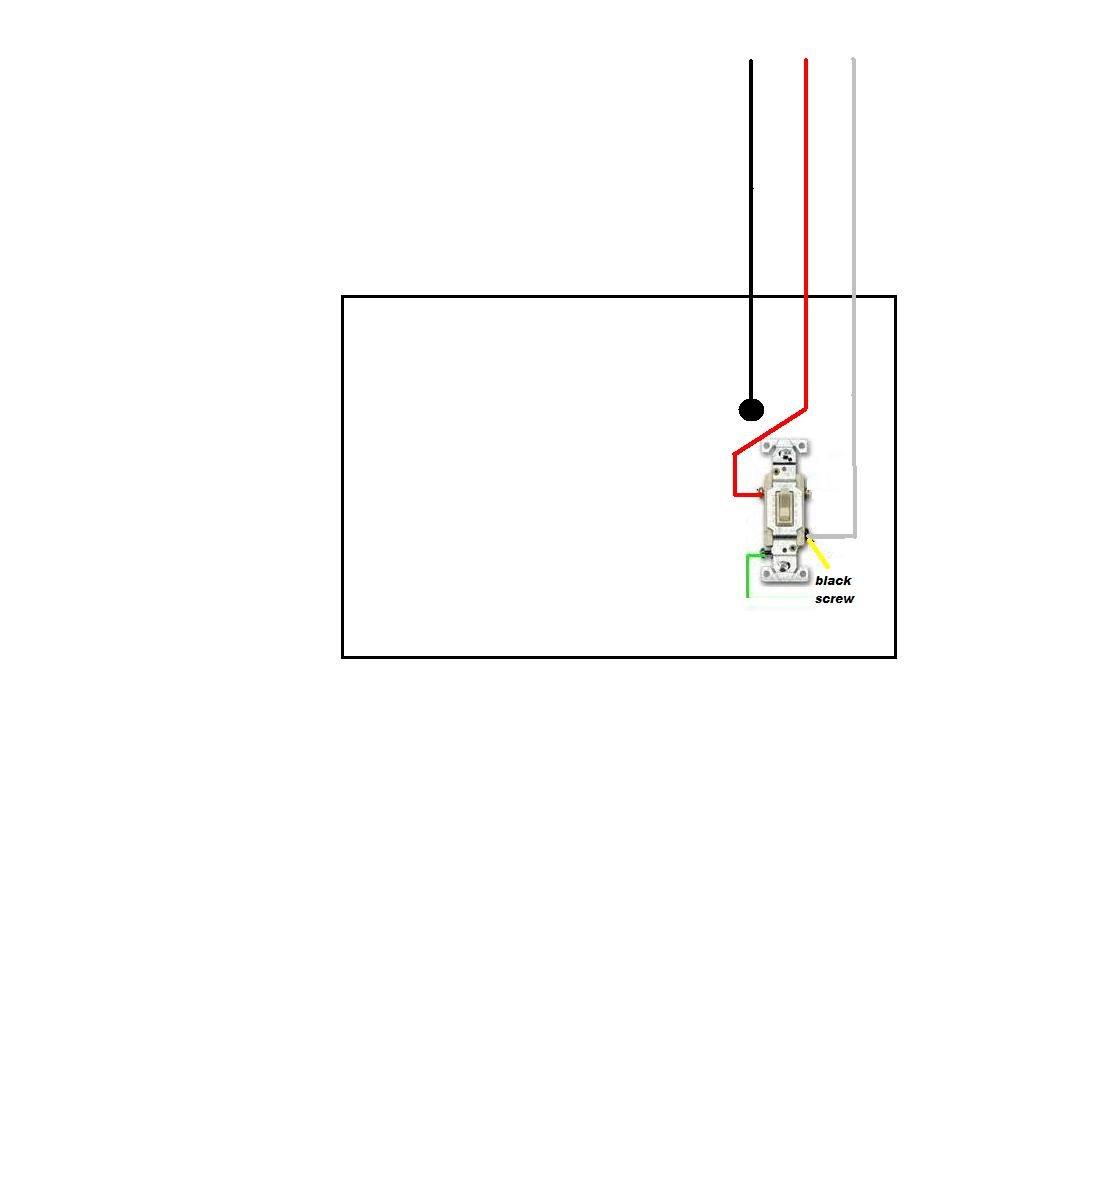 Ceiling 3 Way Occupancy Sensor Wiring Diagram Best Secret Motion Sensors Lutron Switch Photo